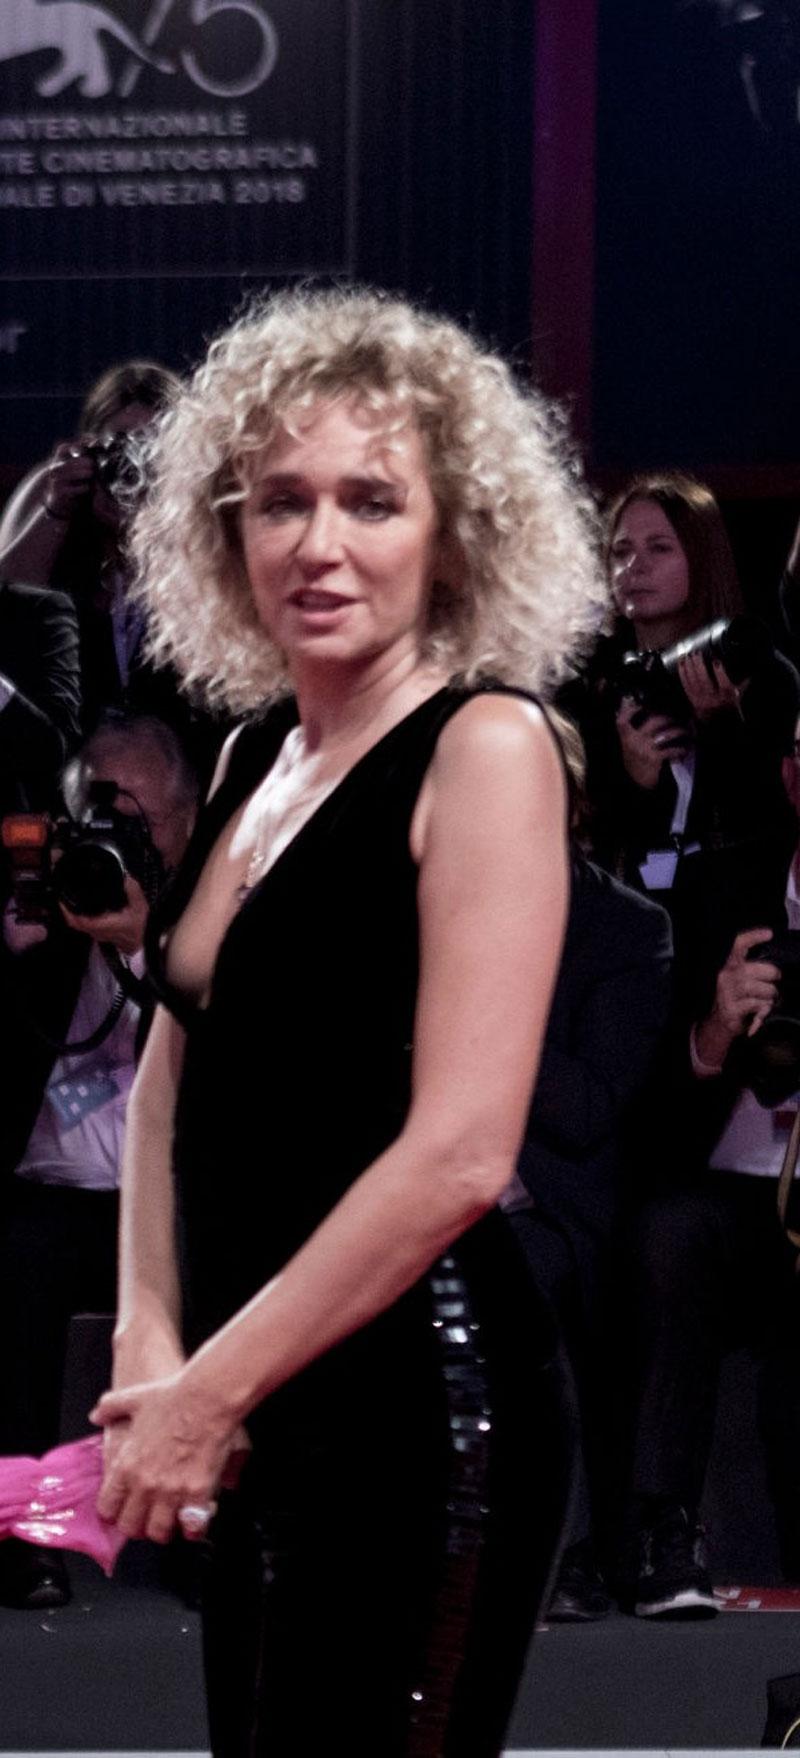 Valerina Golino Nipple Peek on the Red Carpet